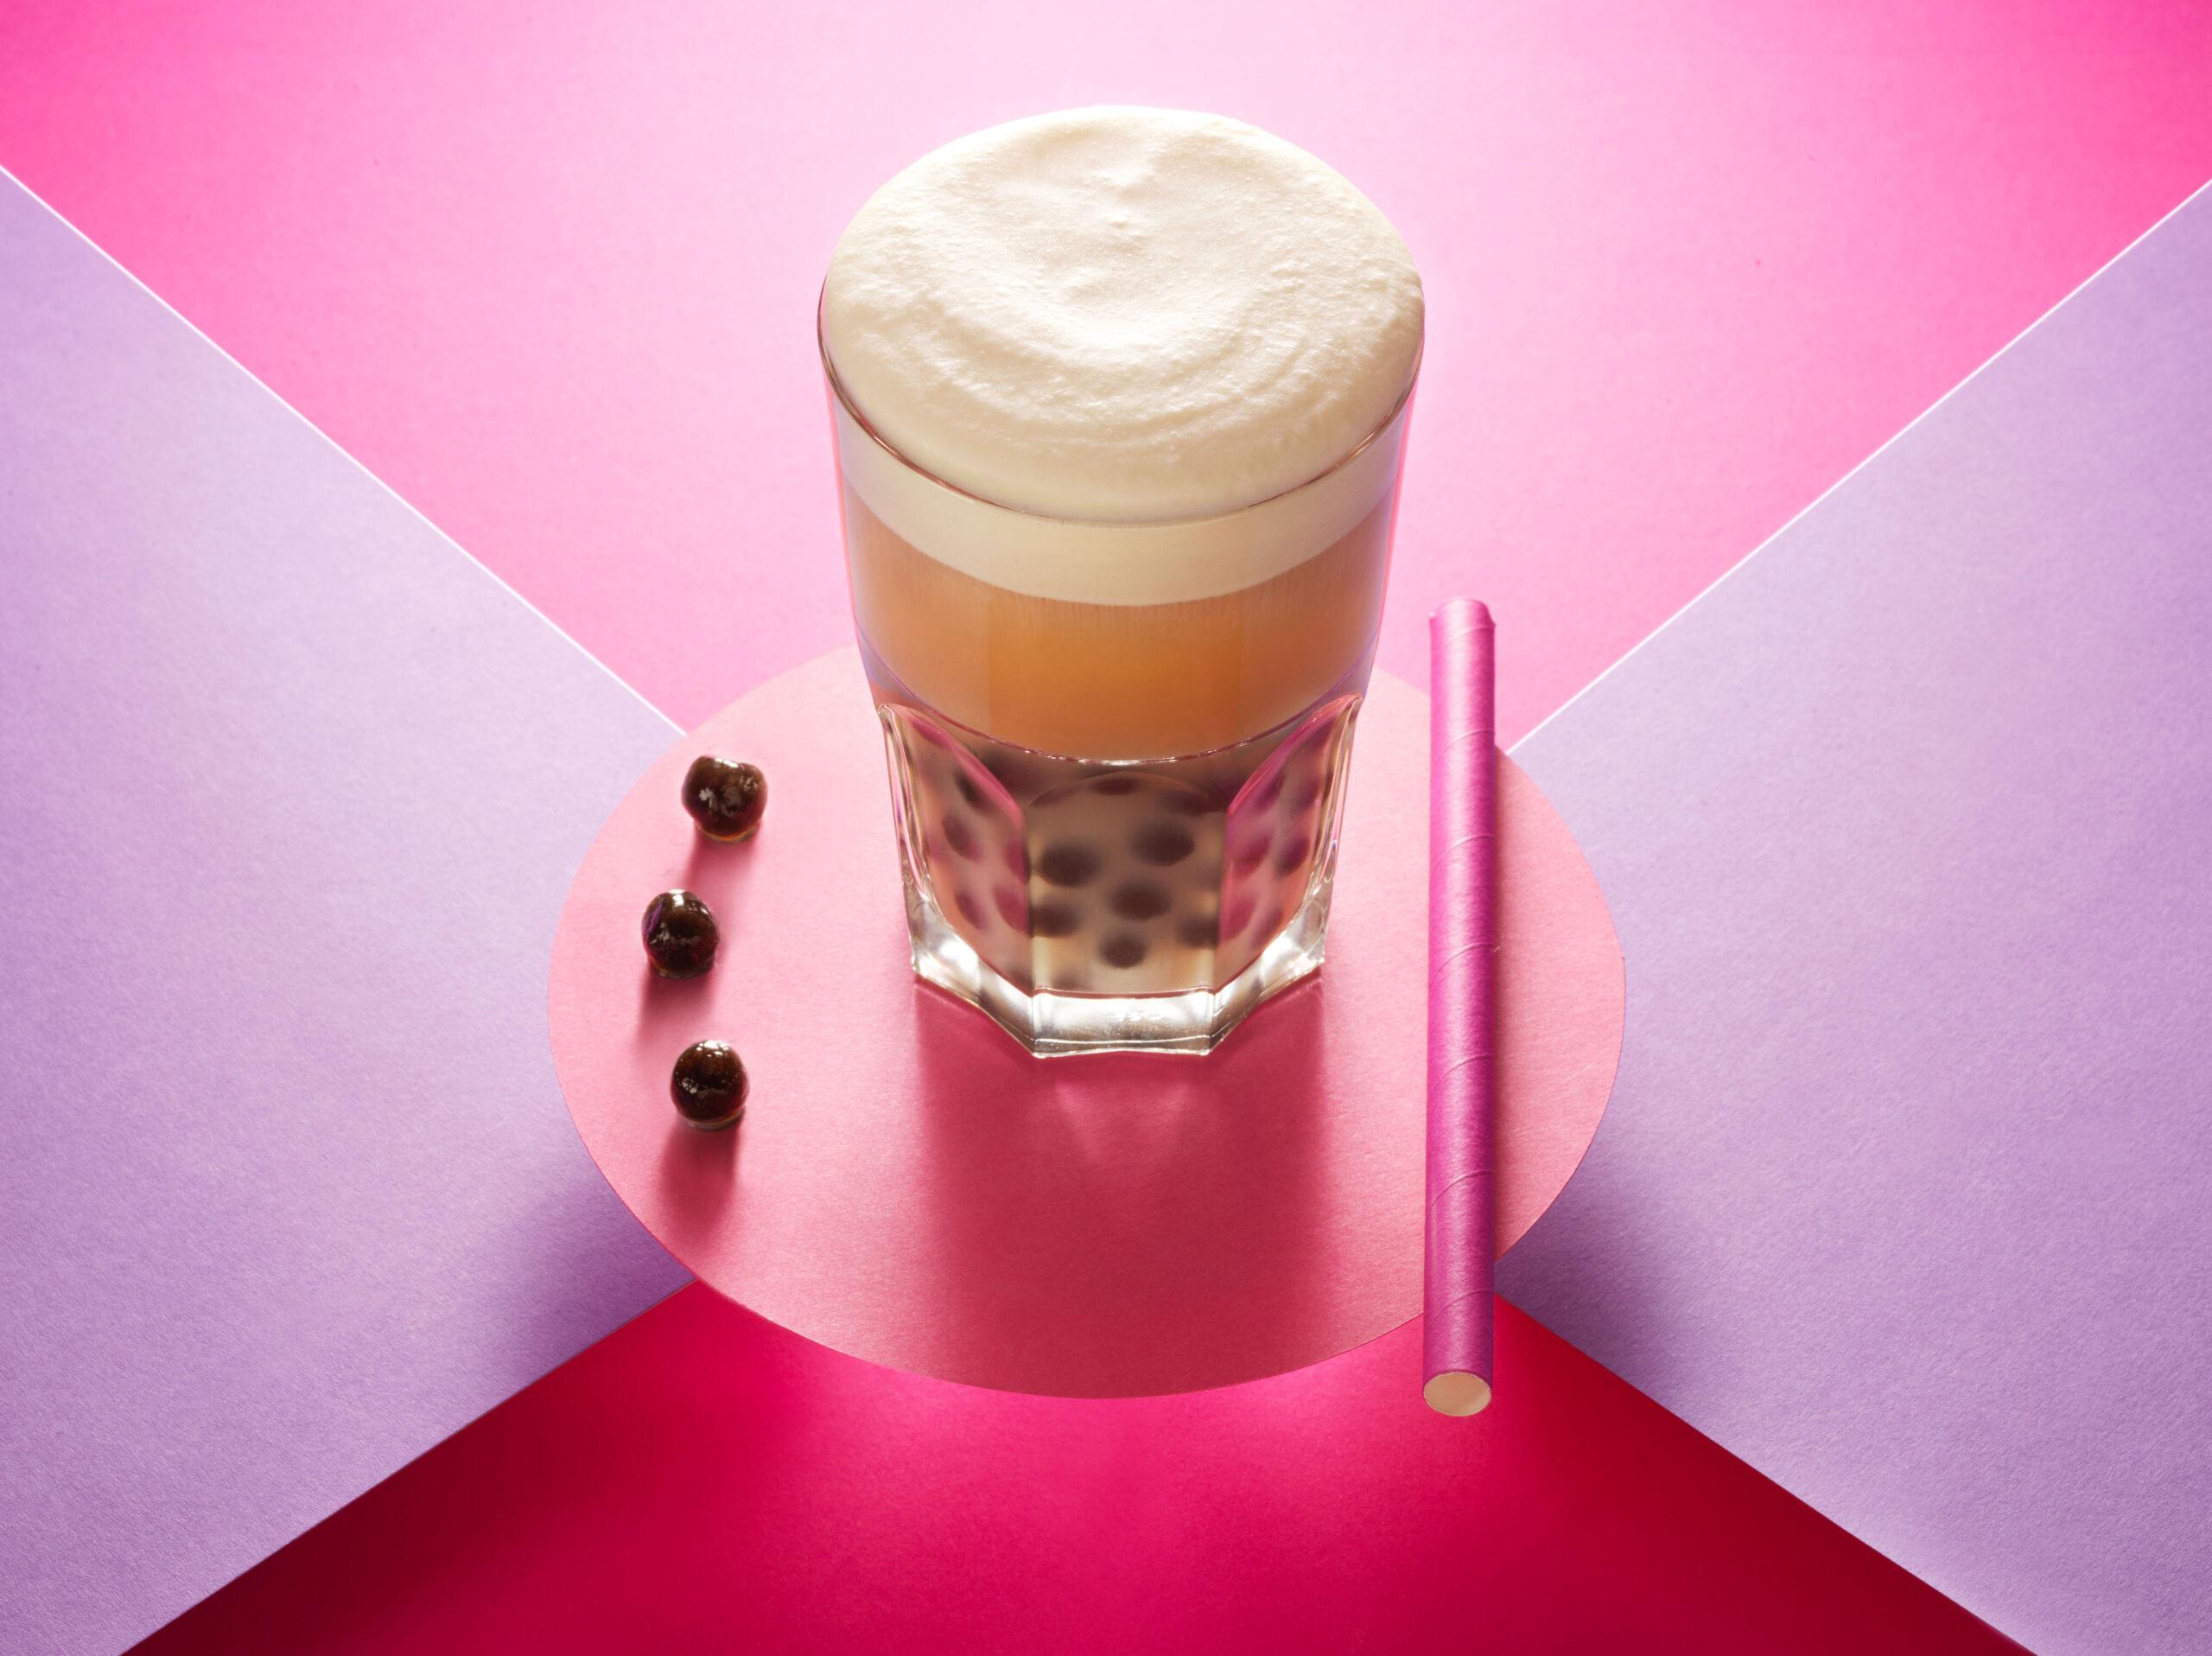 Creative food photo of SmartWhip recipe bubble tea made by STUDIO_M Amsterdam